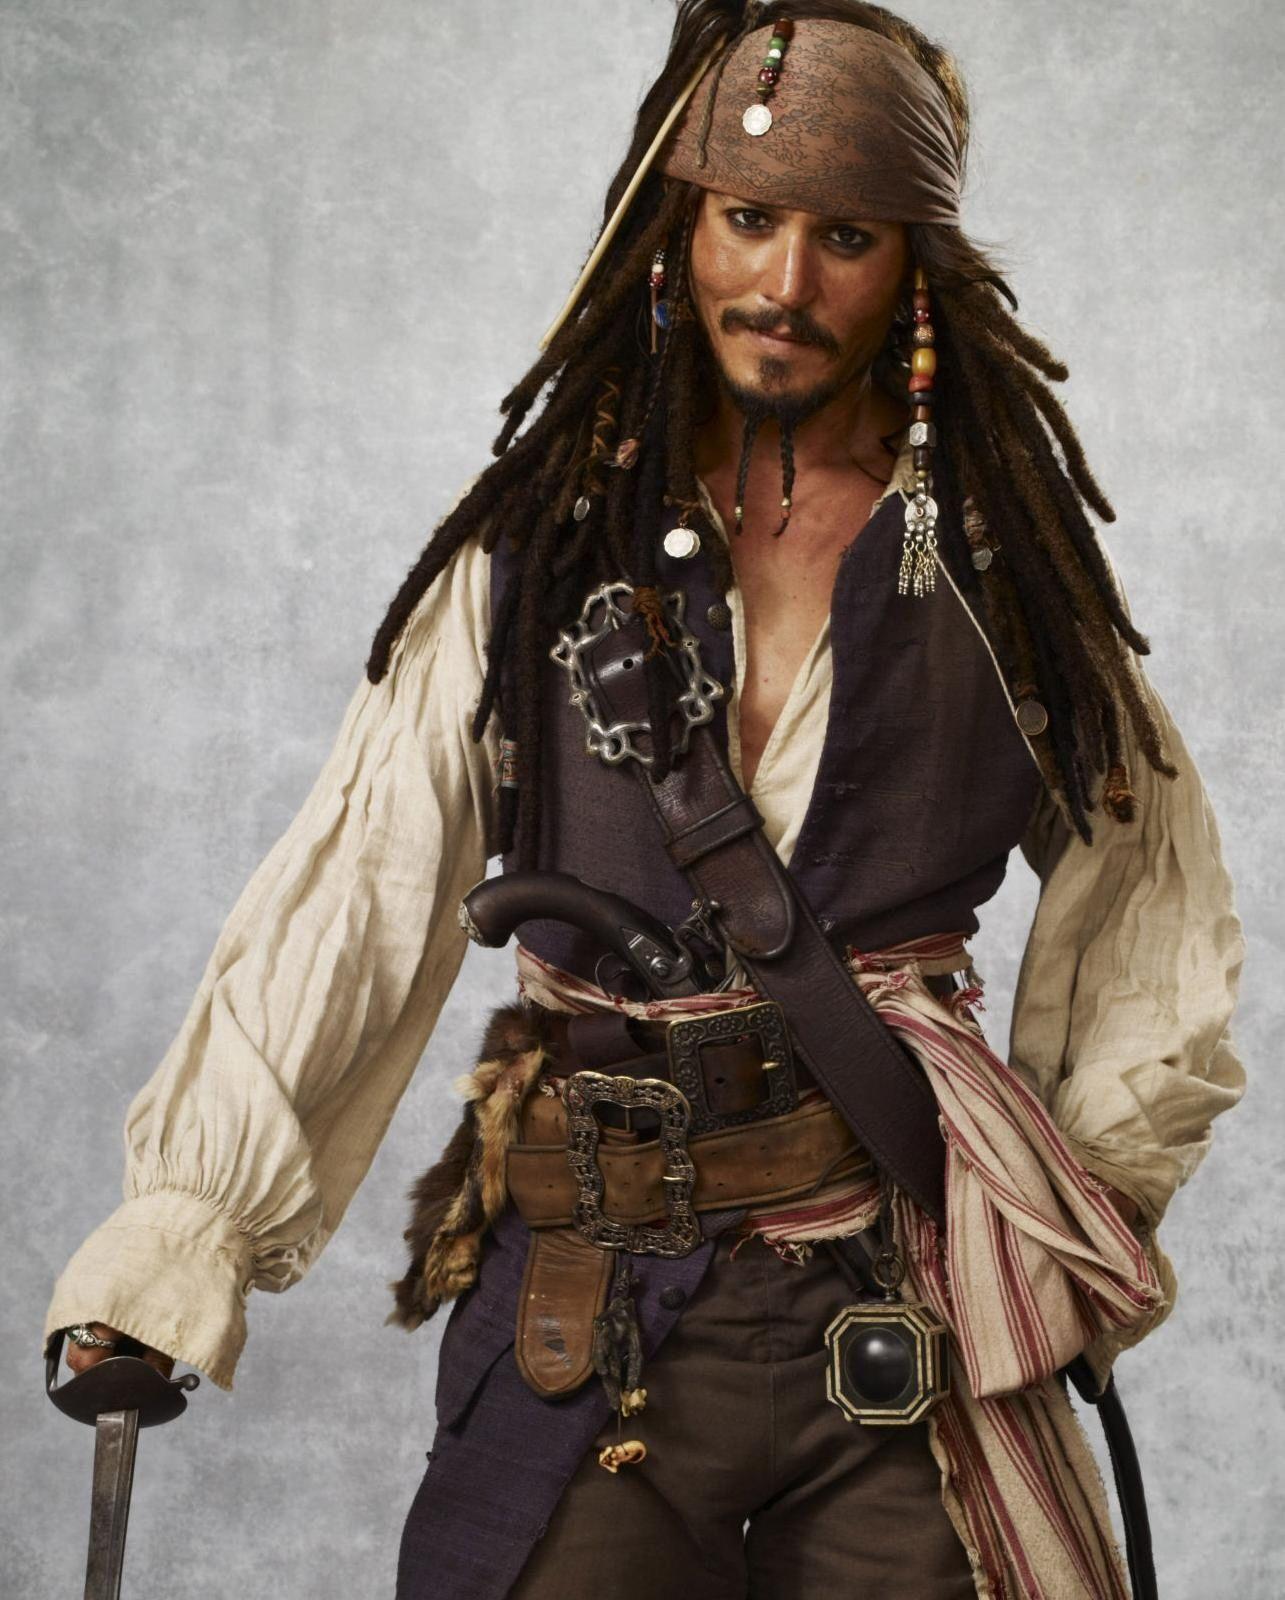 Captain Jack Sparrow Pirates Of The Caribbean 1 4 Played By Johnny Depp Piratas Del Caribe Johnny Depp Gorrion